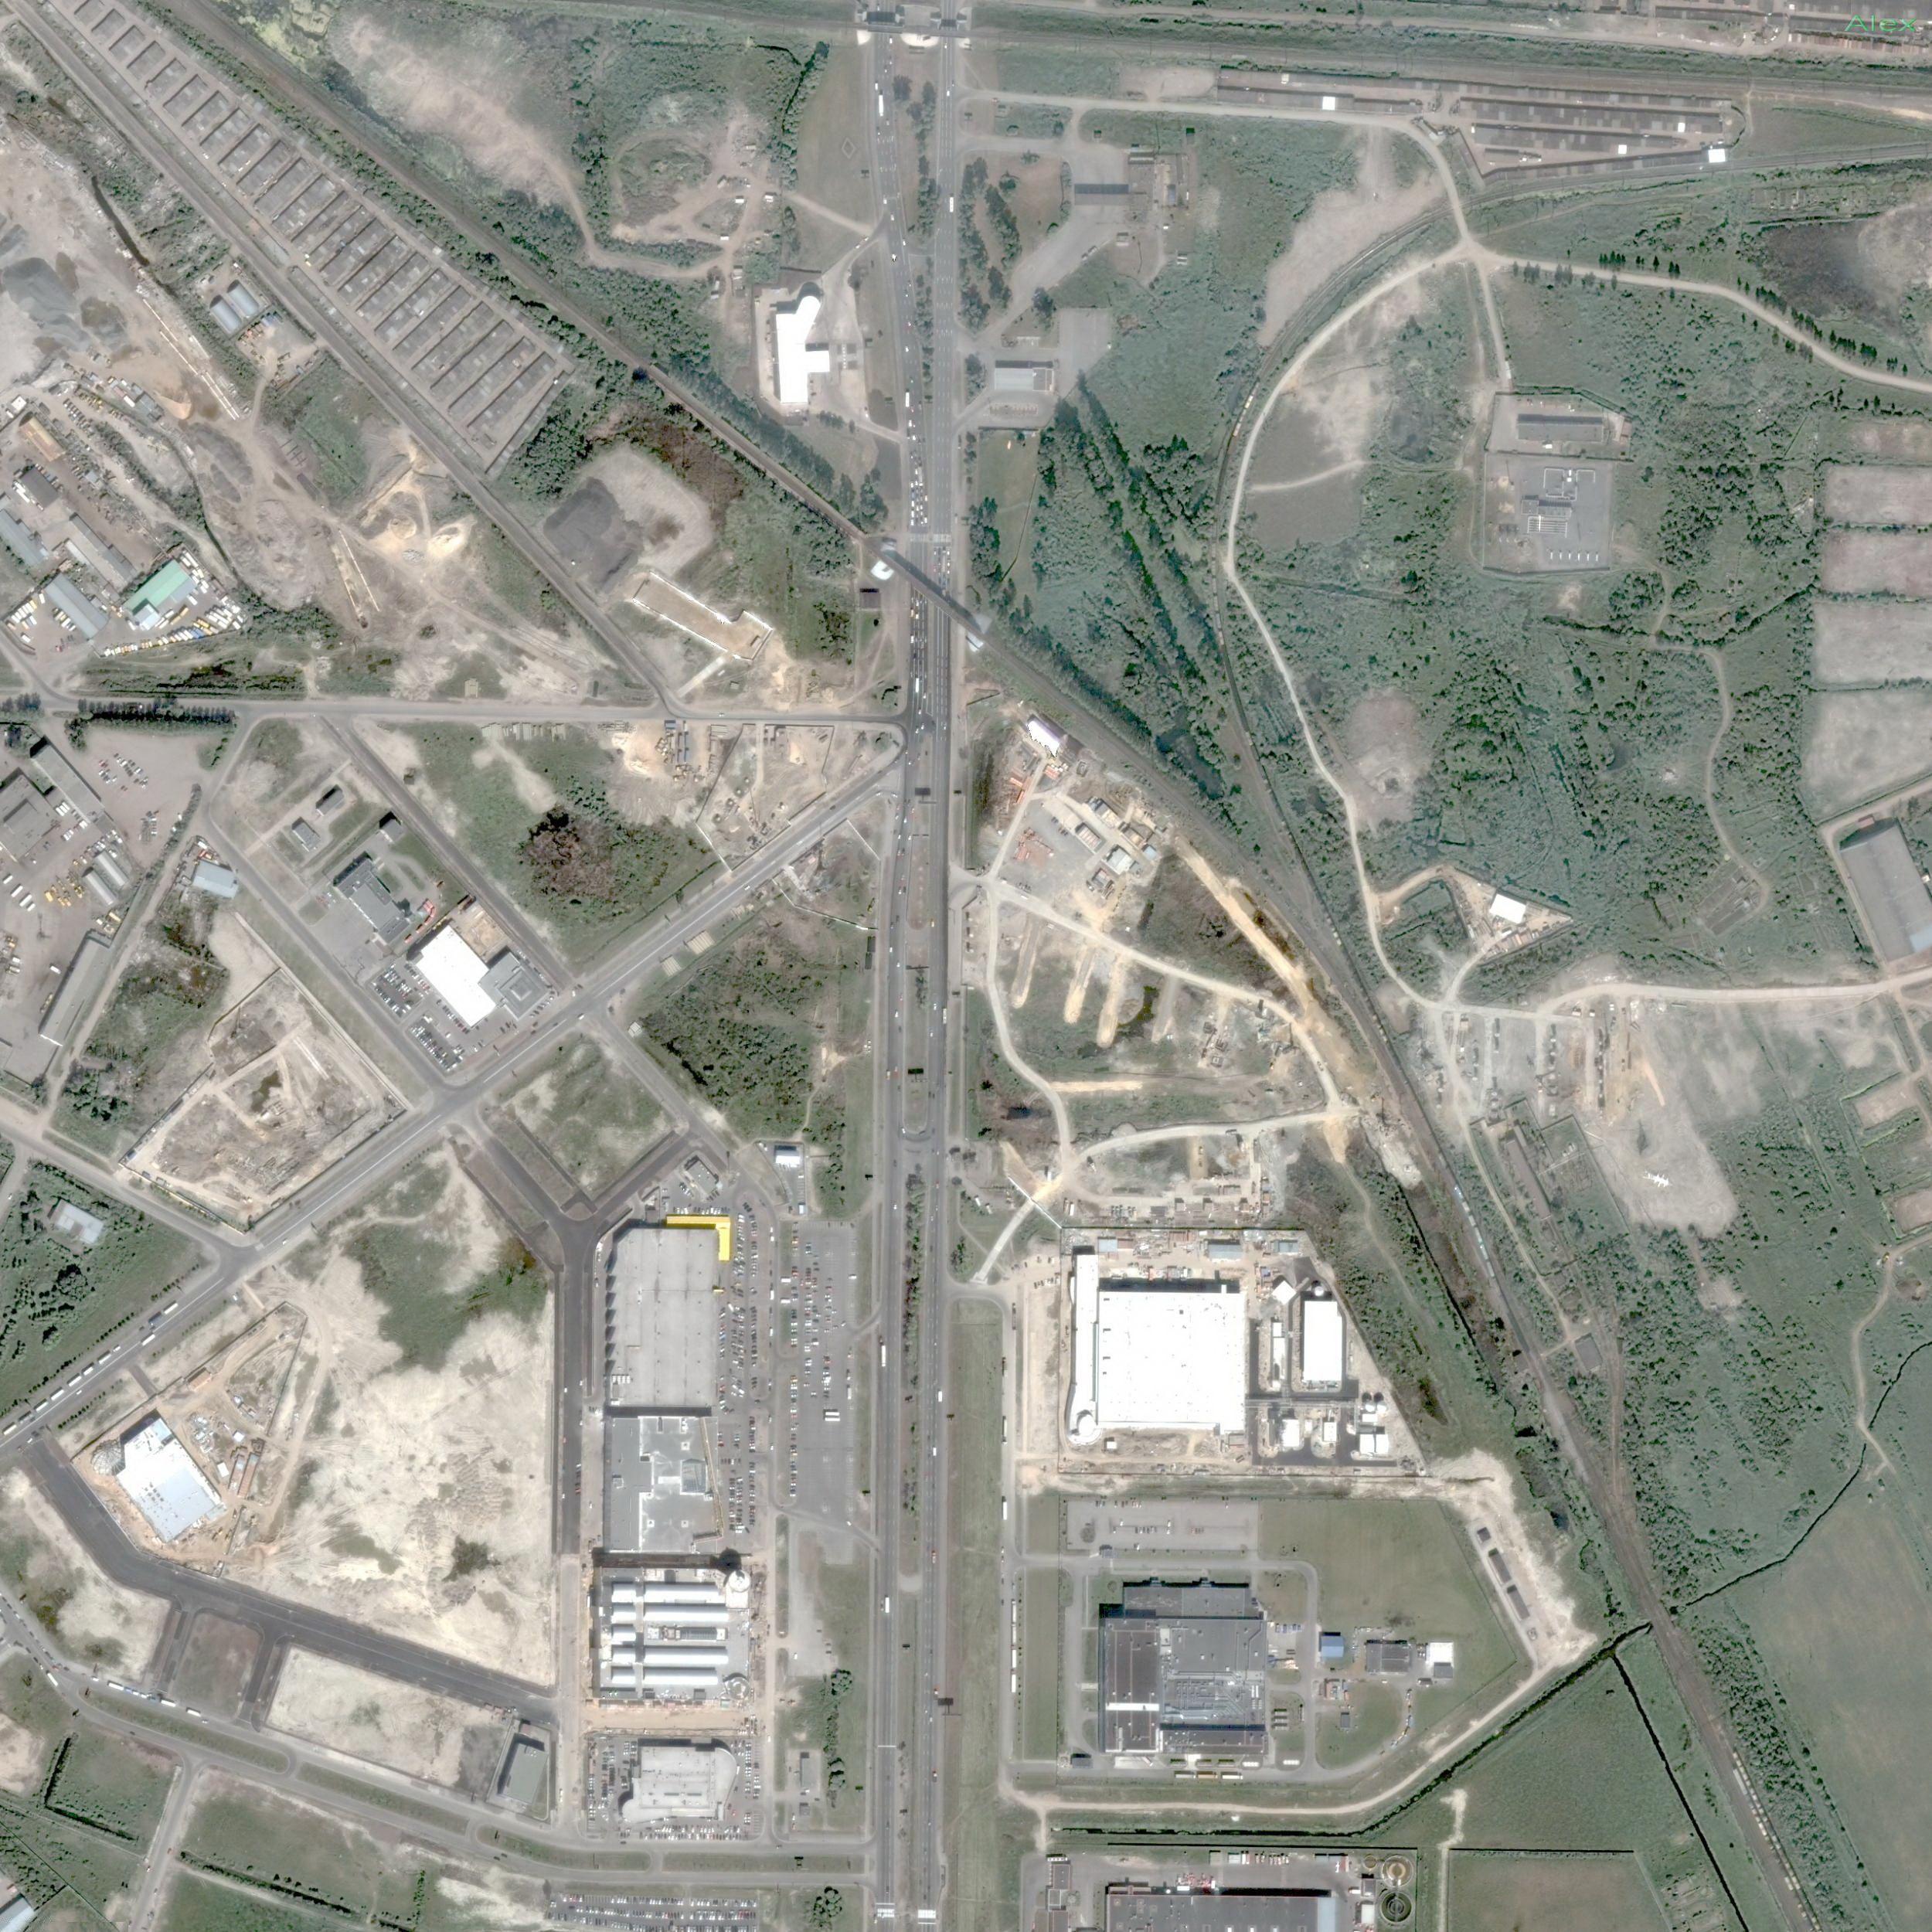 схема развязки на московском шоссе